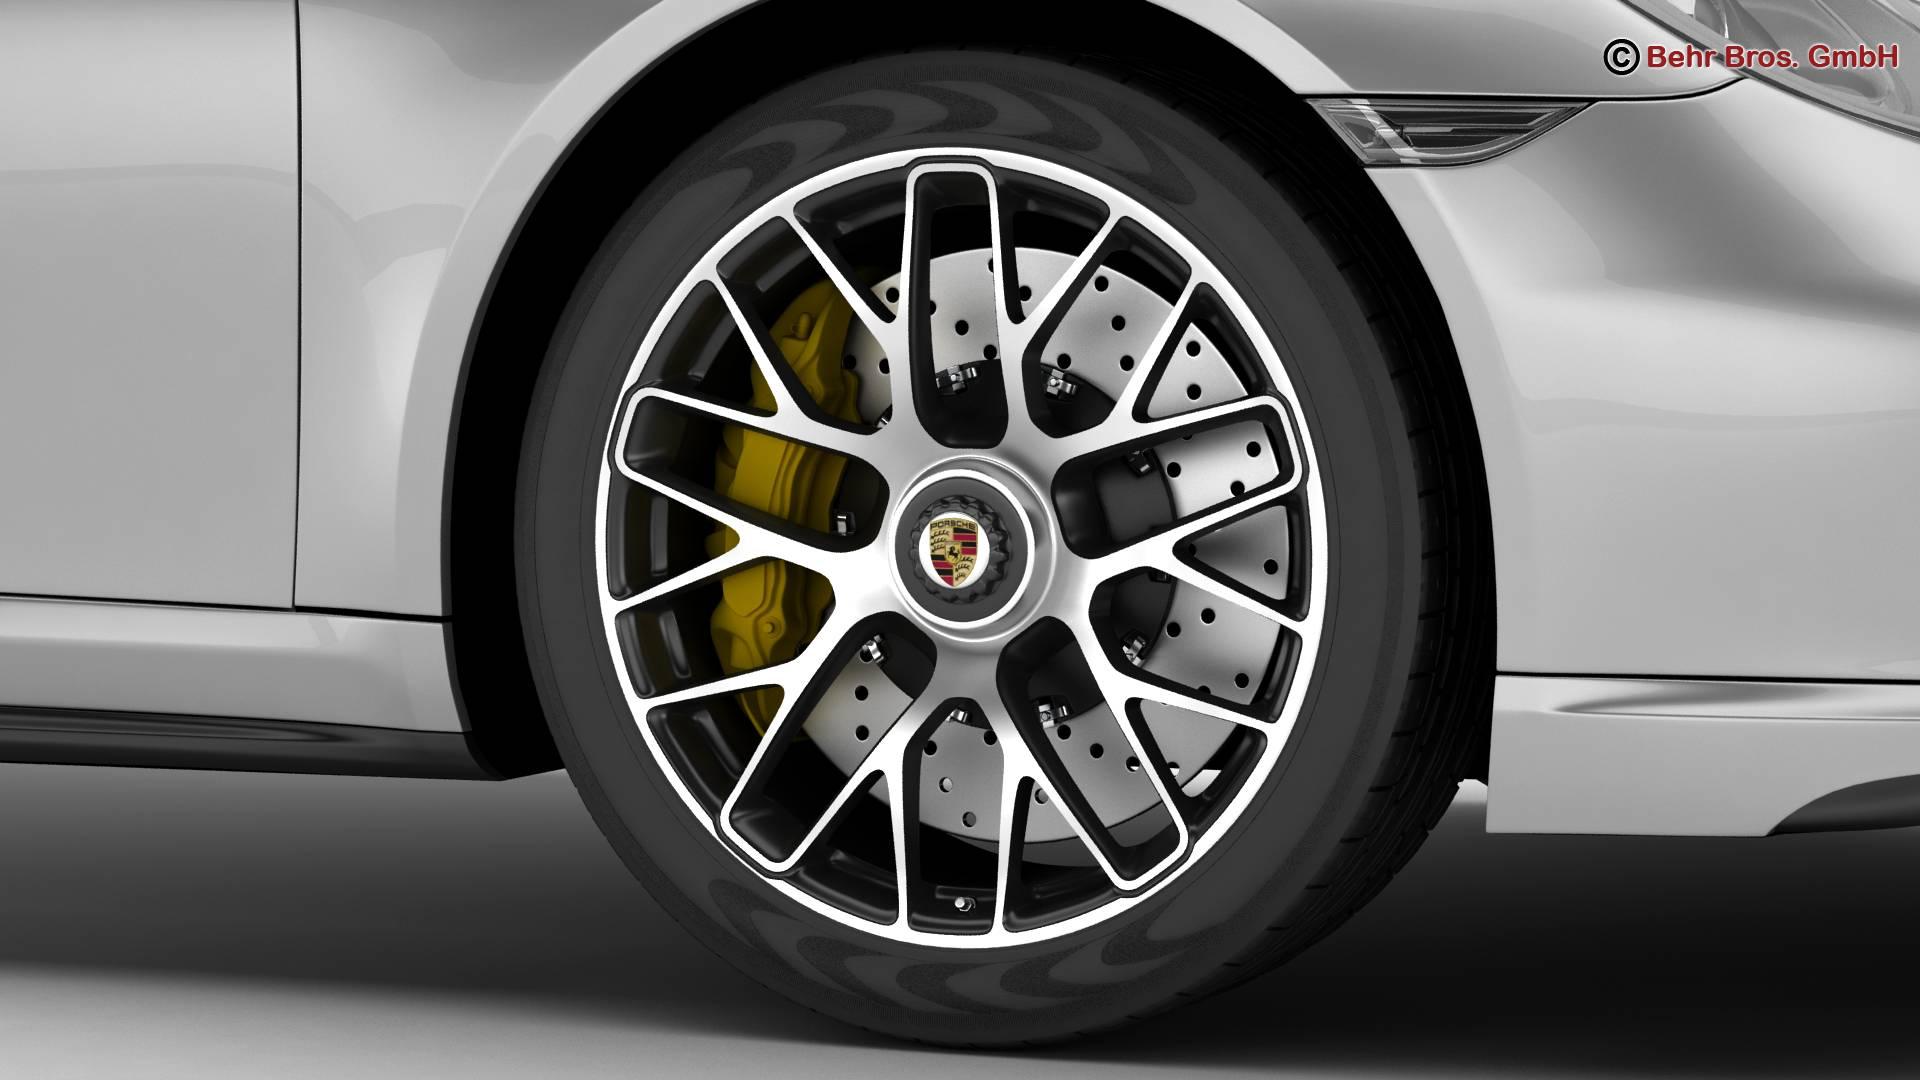 porsche 911 turbo s 2014 3d model 3ds max fbx c4d lwo ma mb obj 212484